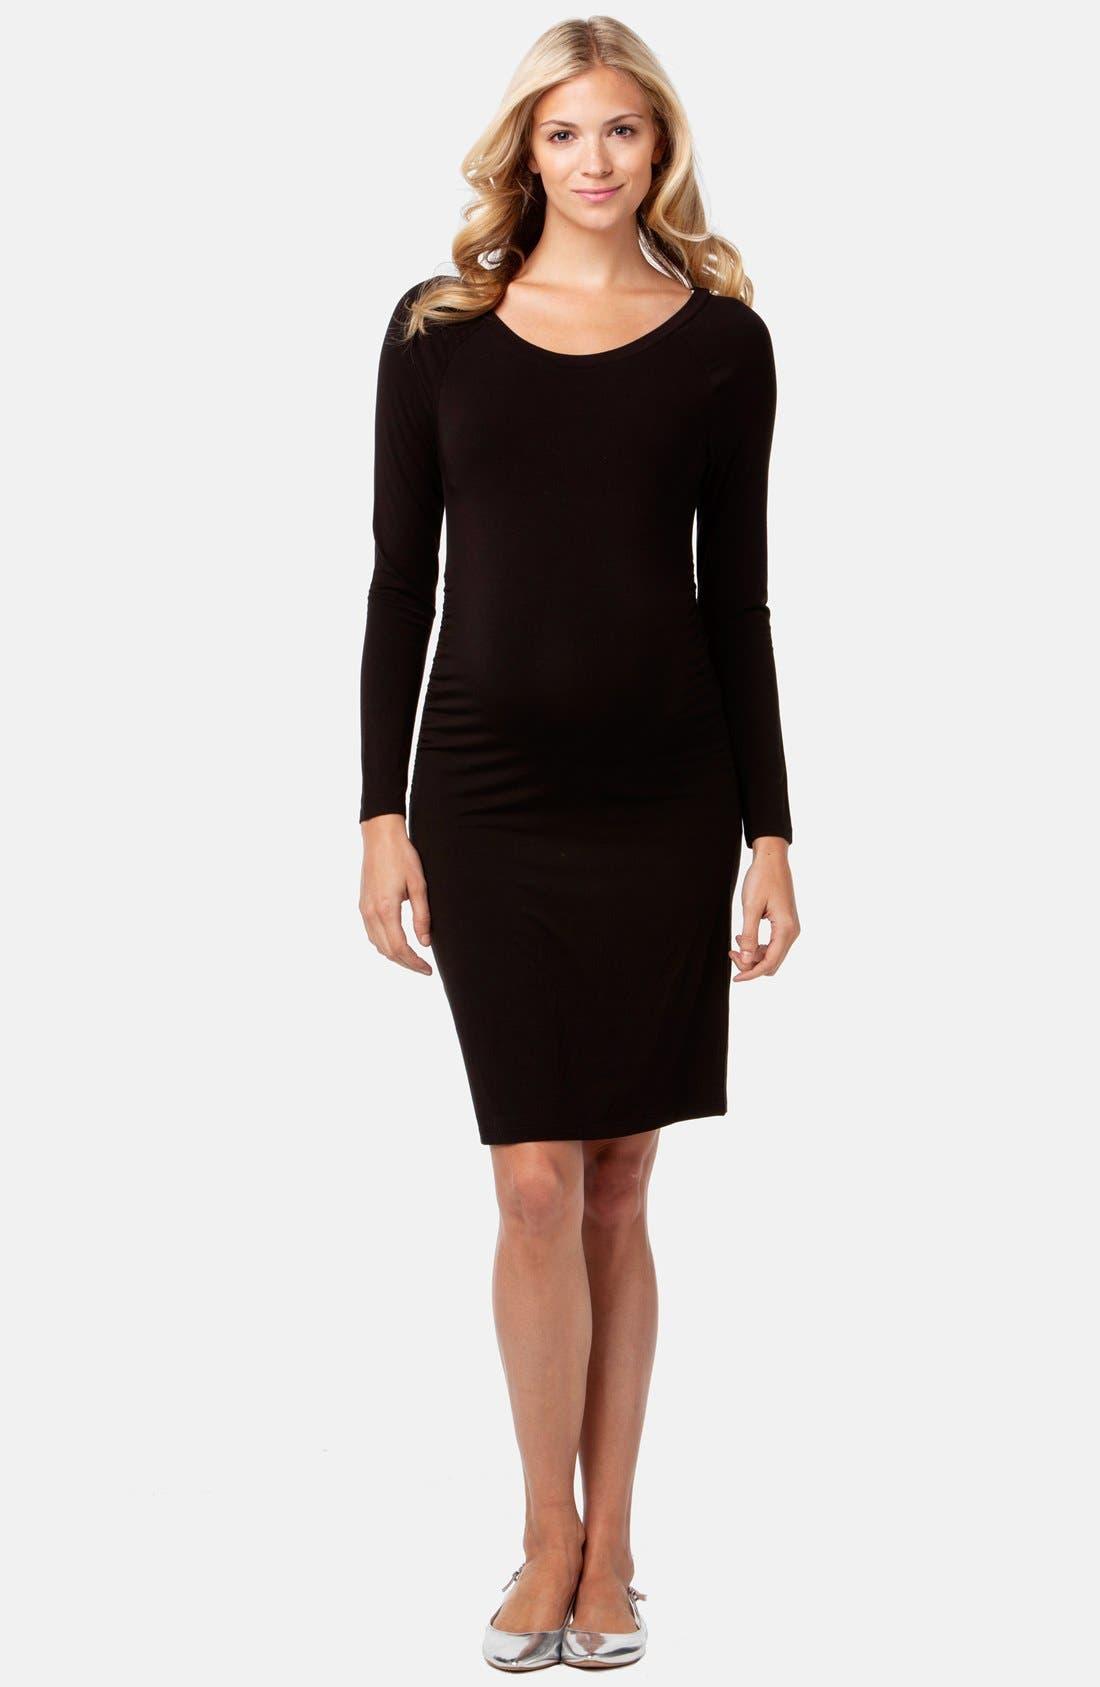 Rosie Pope Maternity Sheath Dress, Black